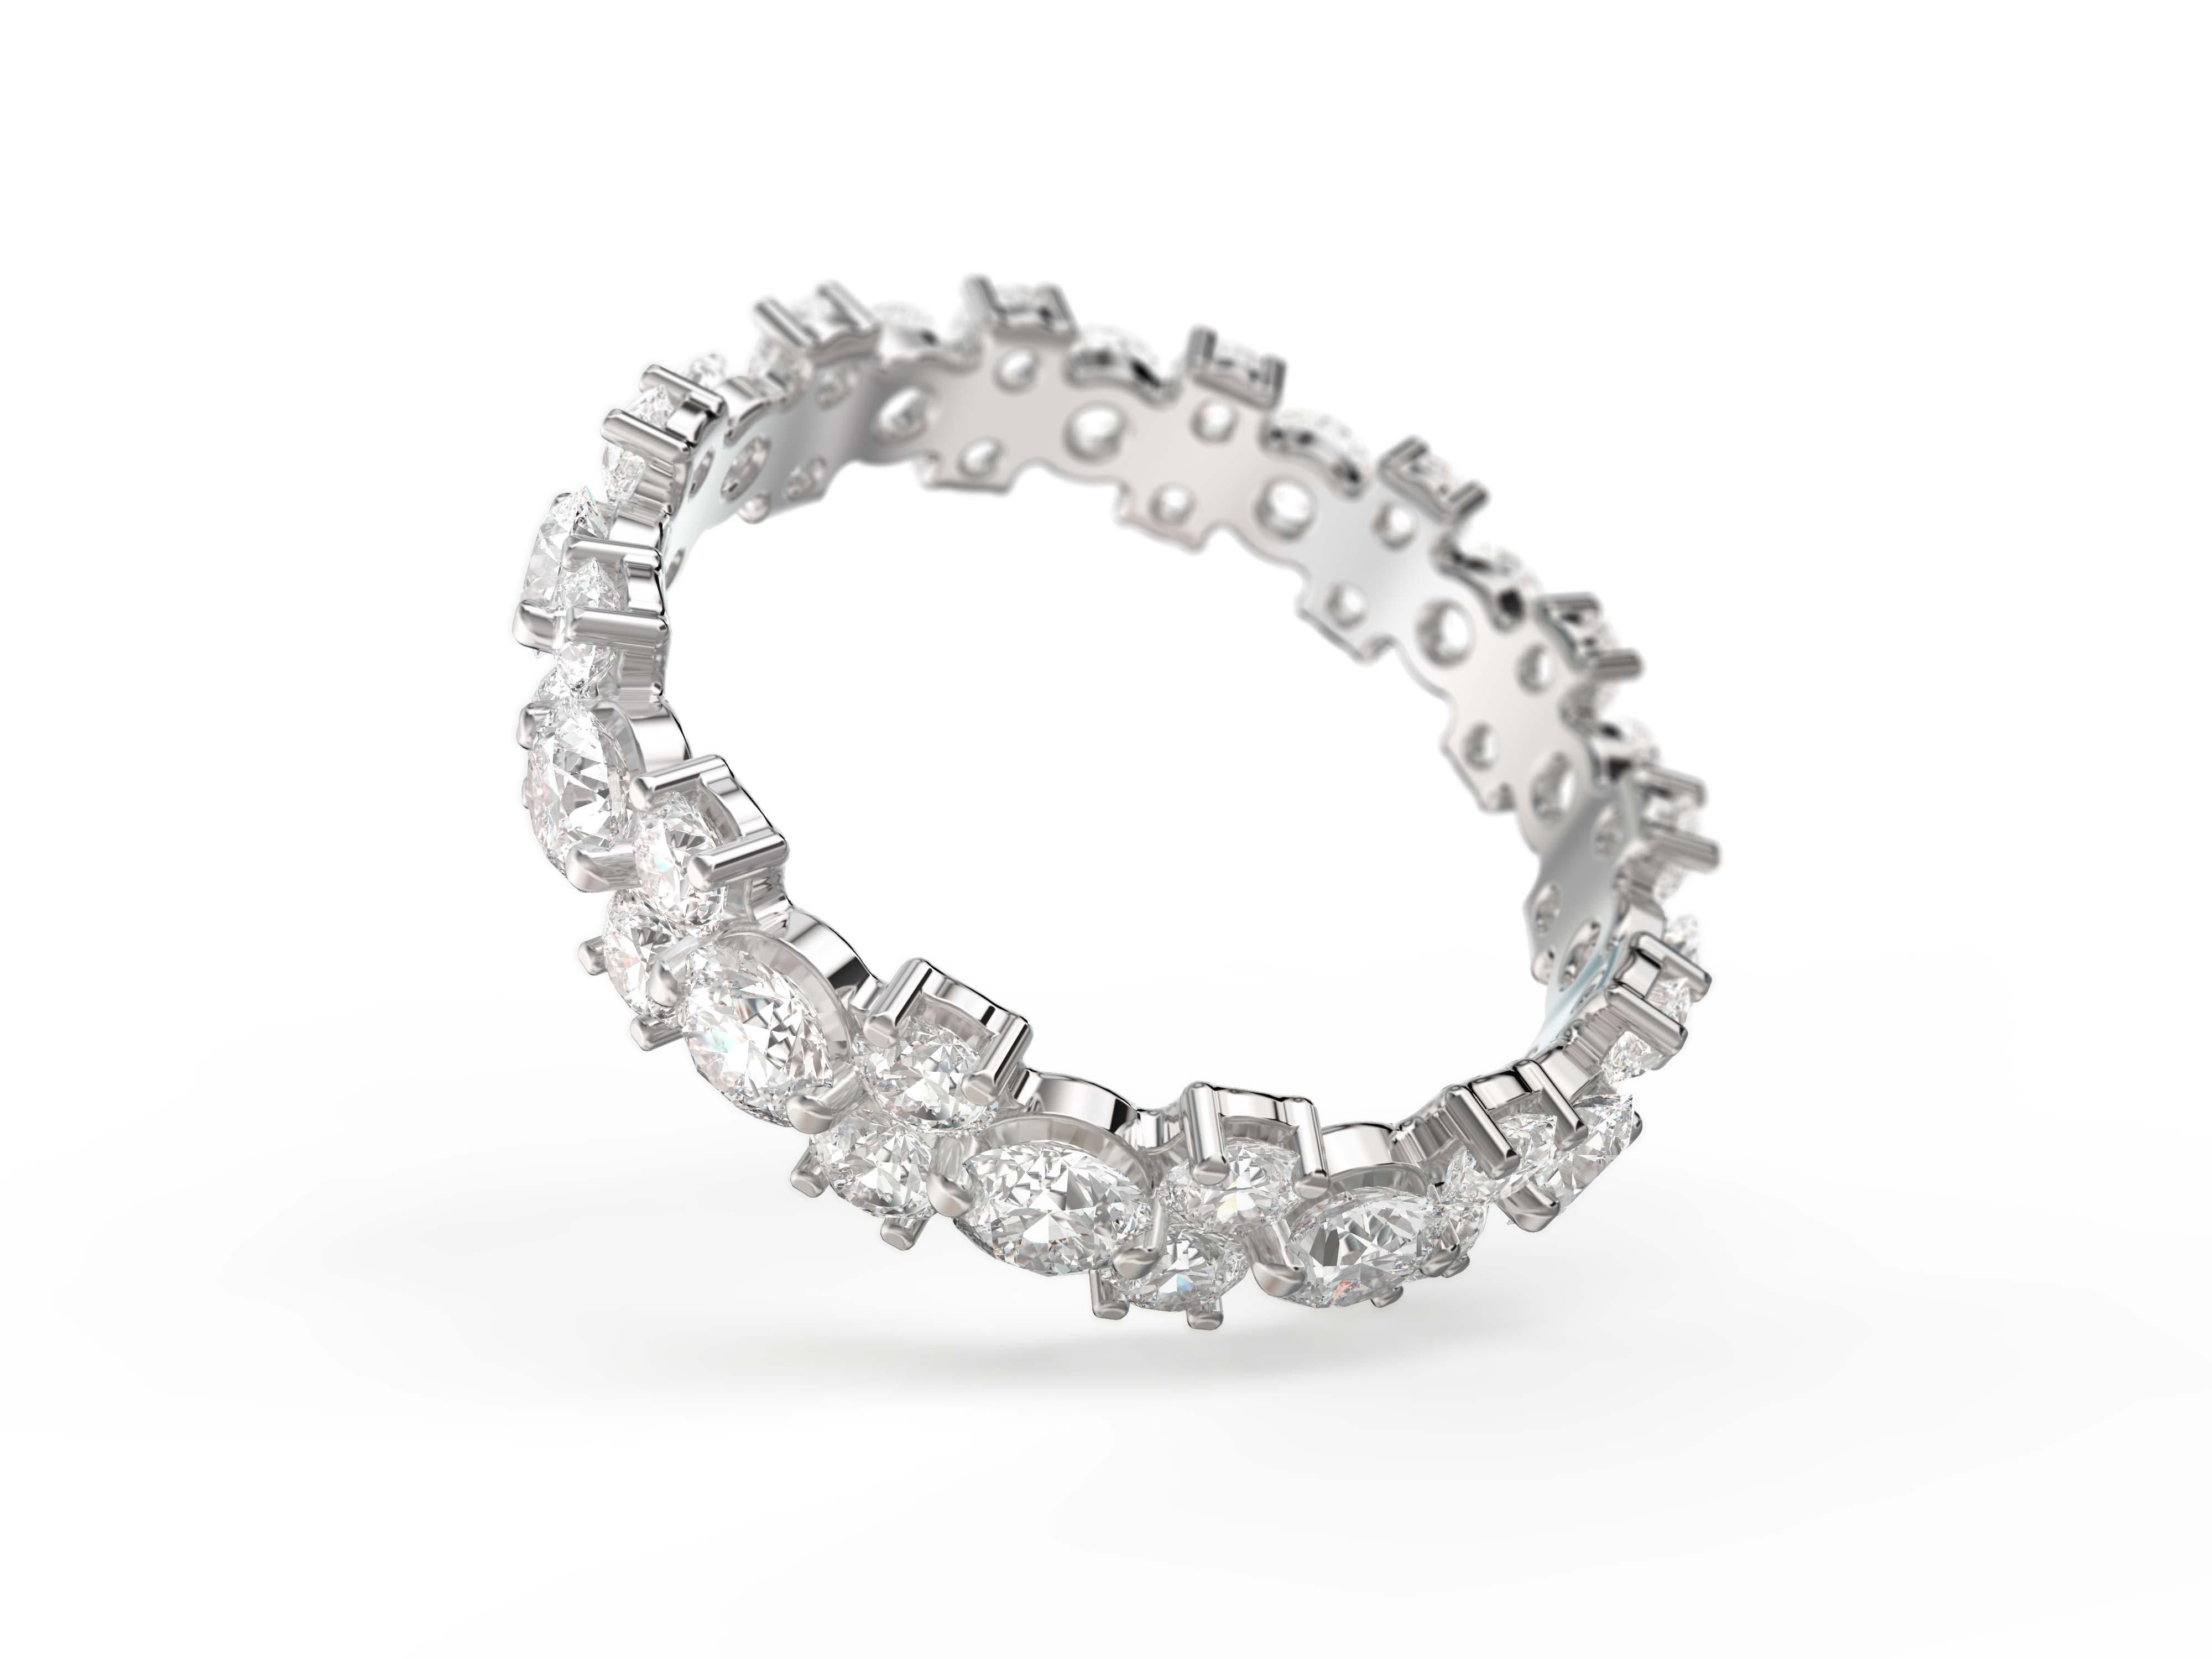 Diamond Ring Render